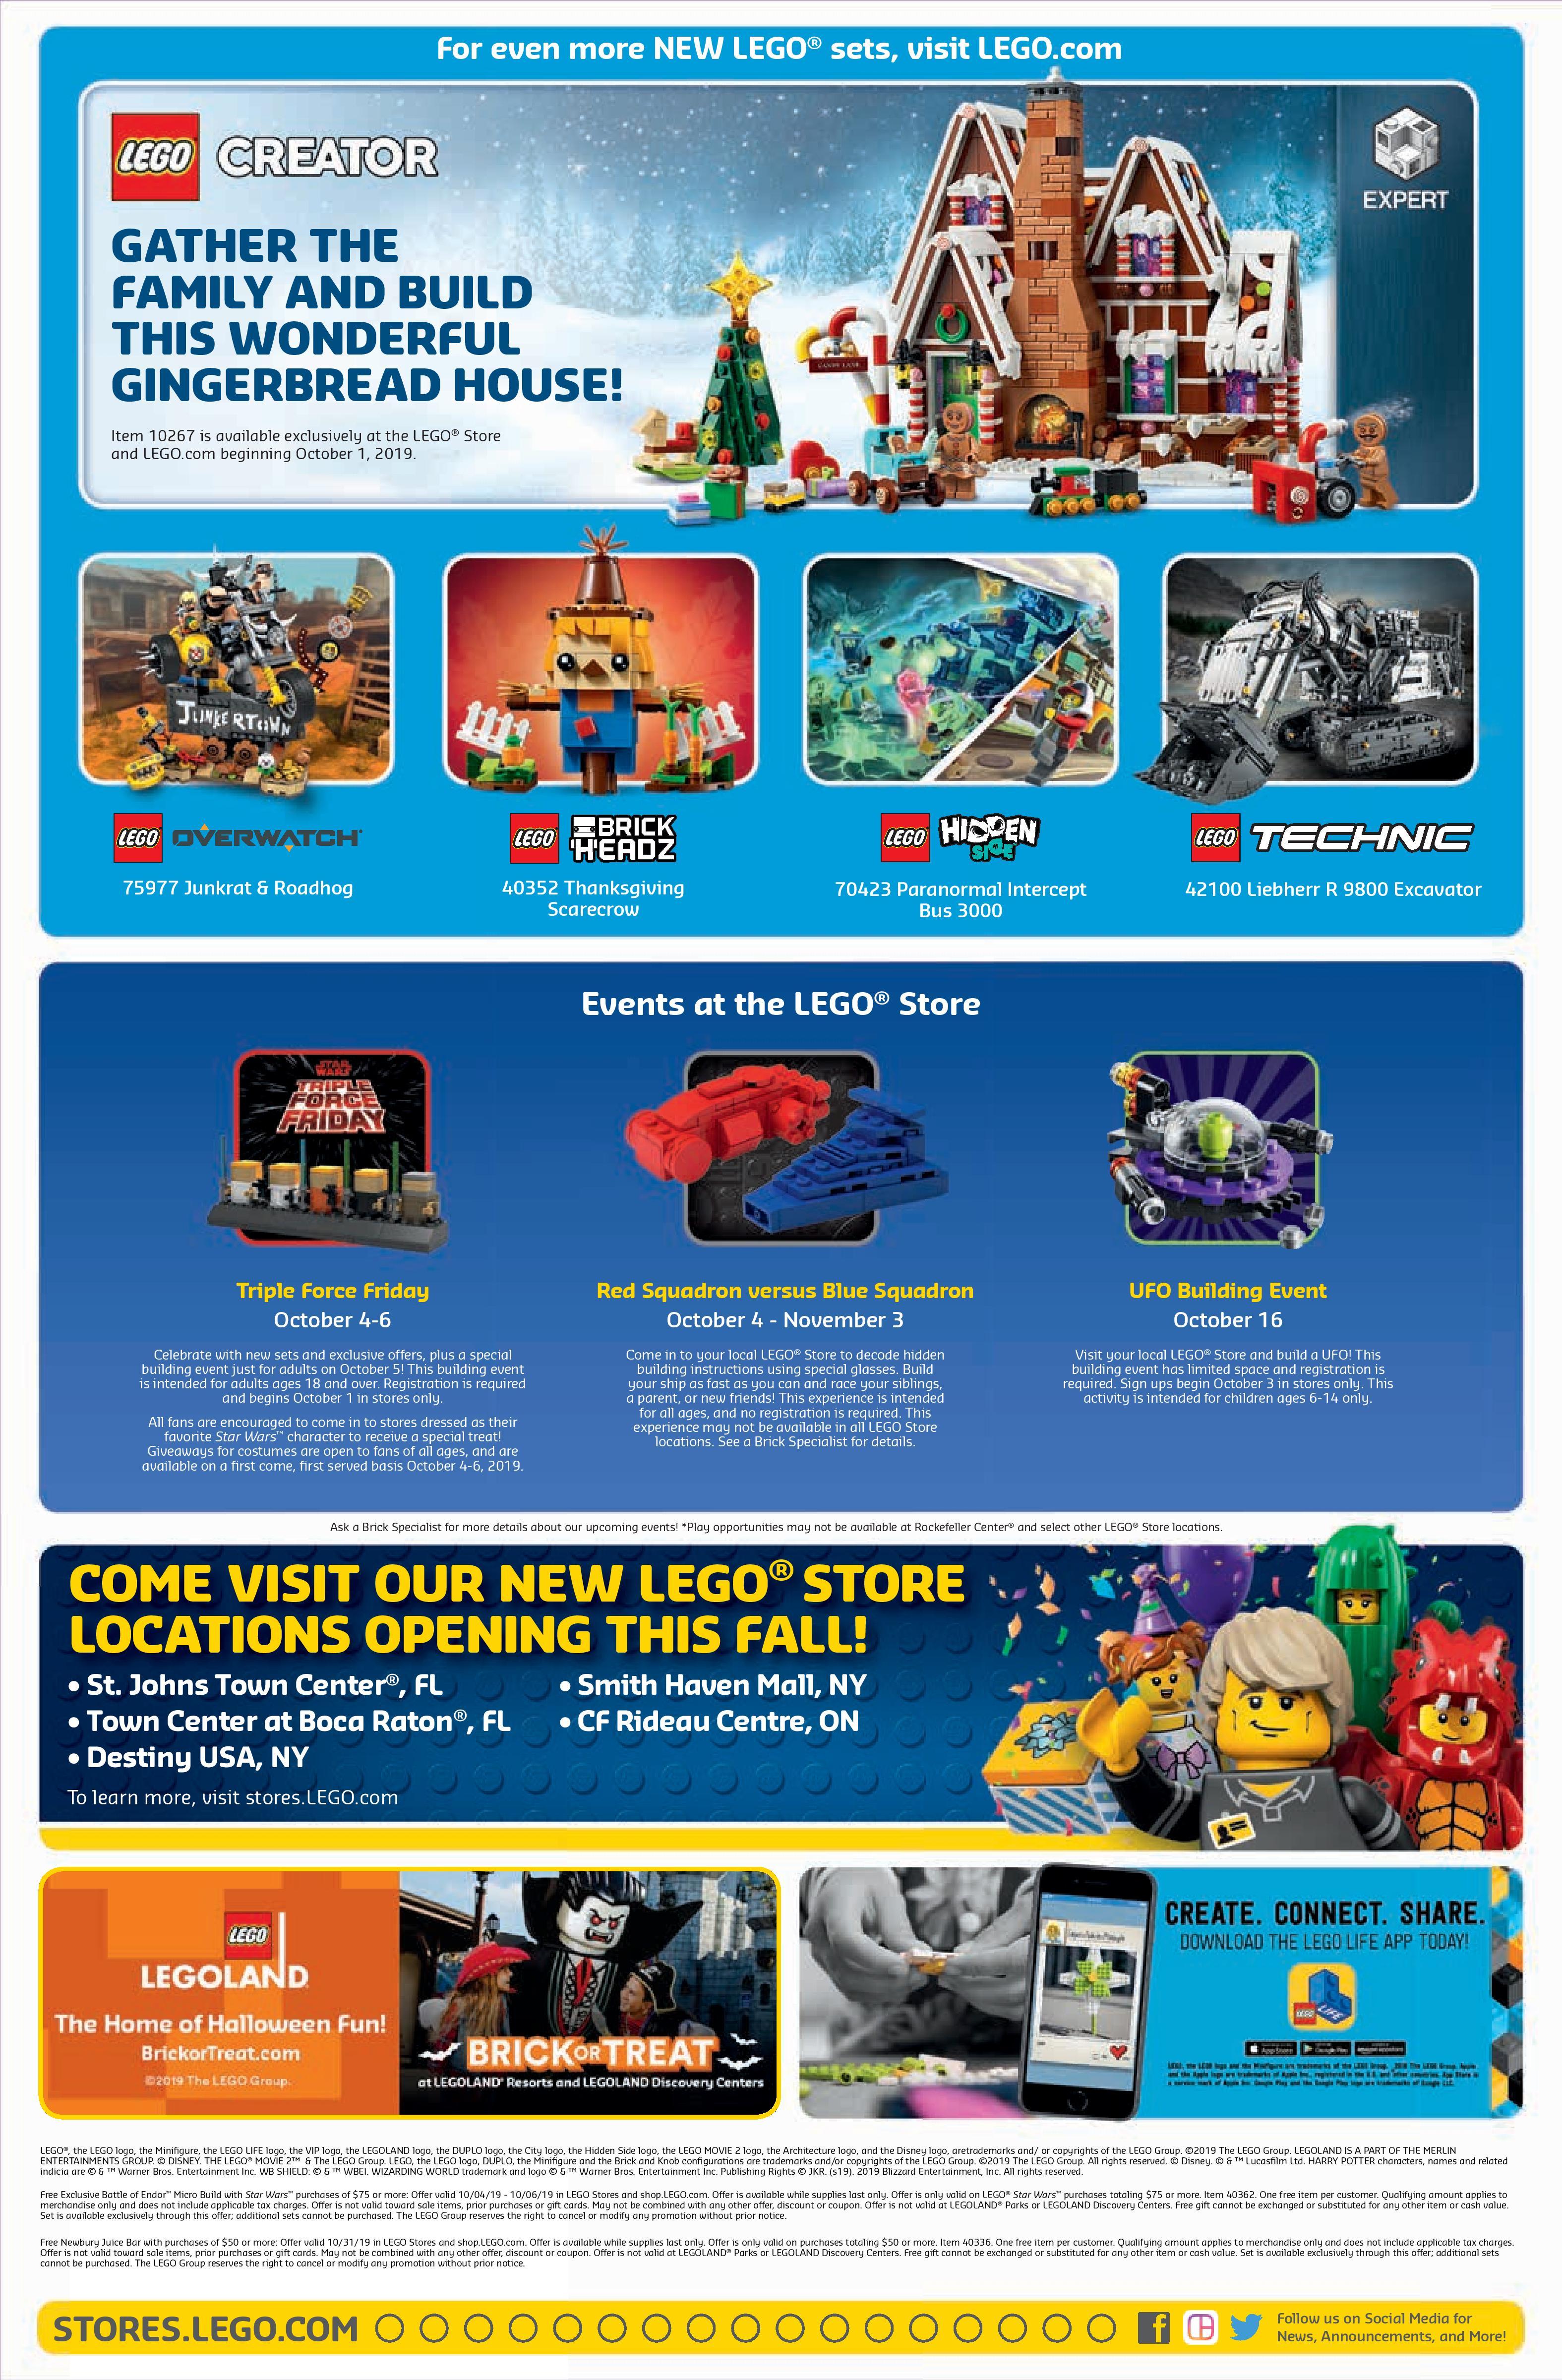 Lego October 2022 Calendar.Lego October 2019 Store Calendar Promotions Events The Brick Fan